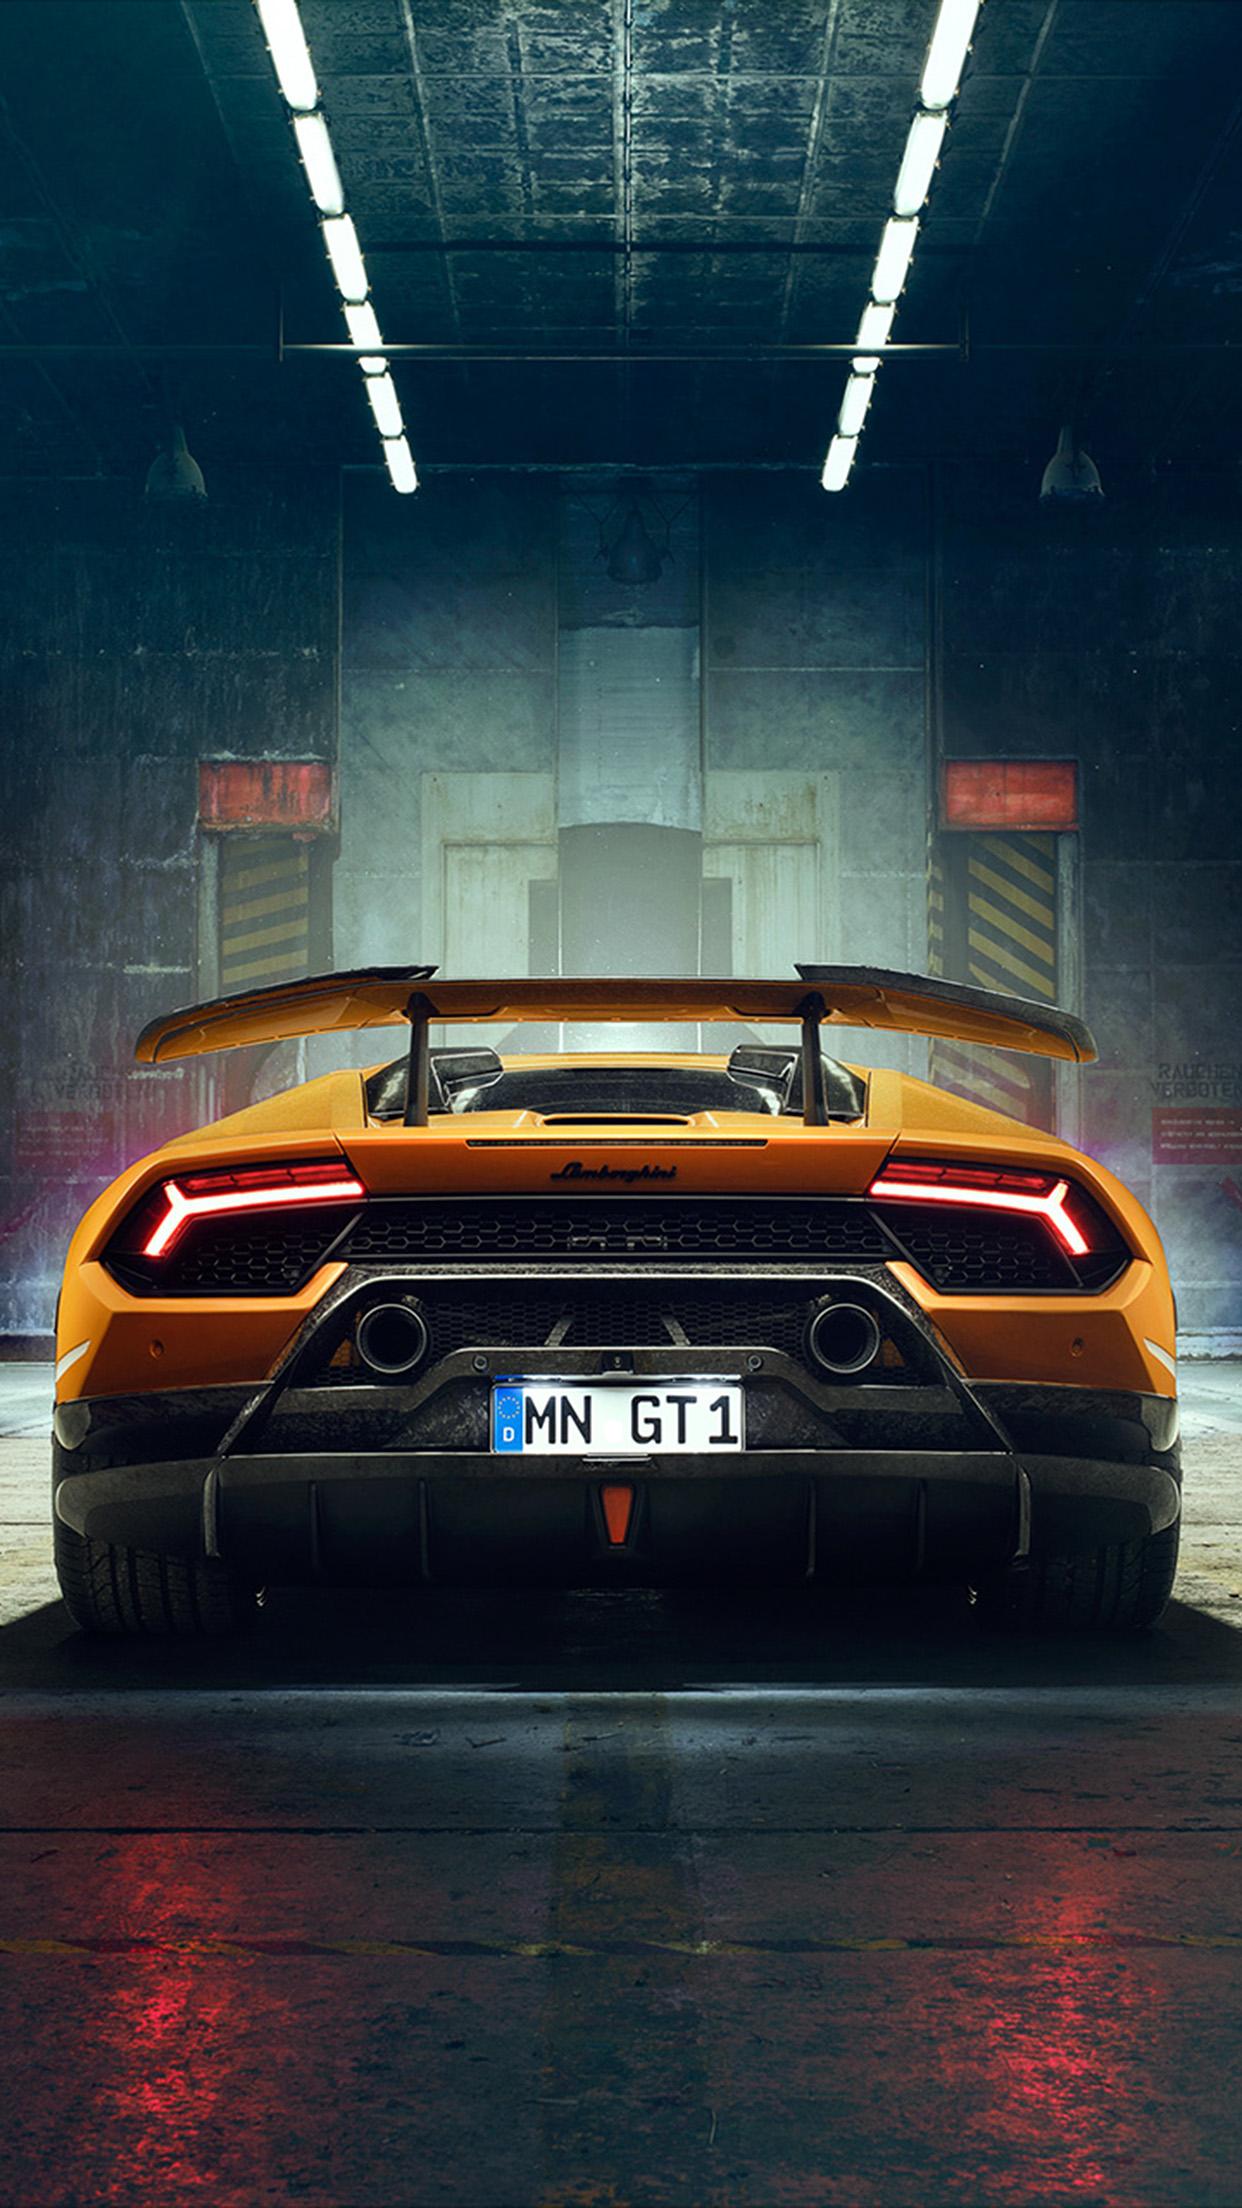 Iphonepapers Com Iphone Wallpaper Bh12 Lamborghini Car